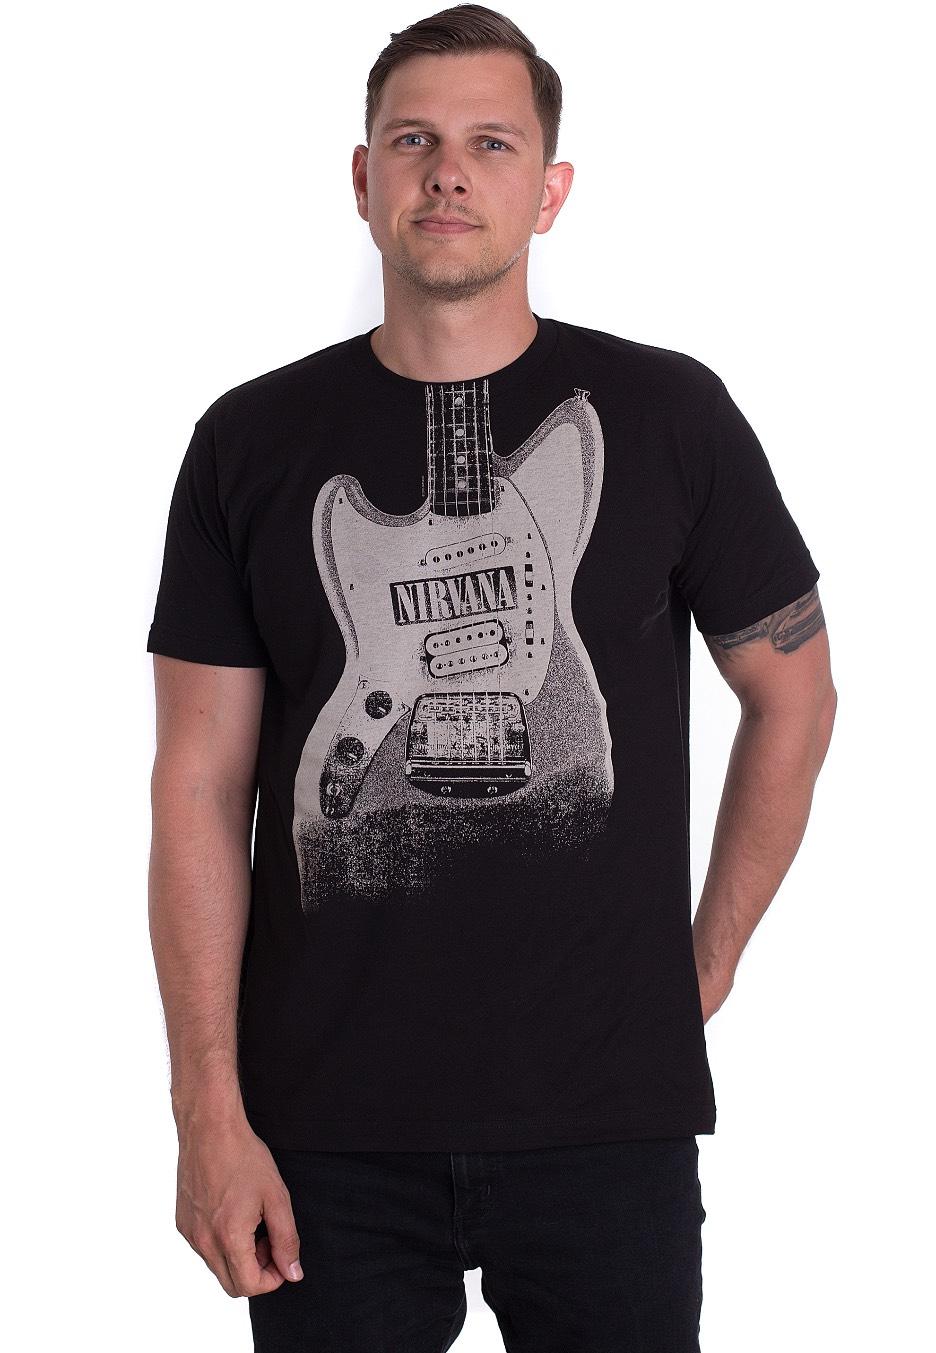 Nirvana - Guitar Image Discharge - - T-Shirts